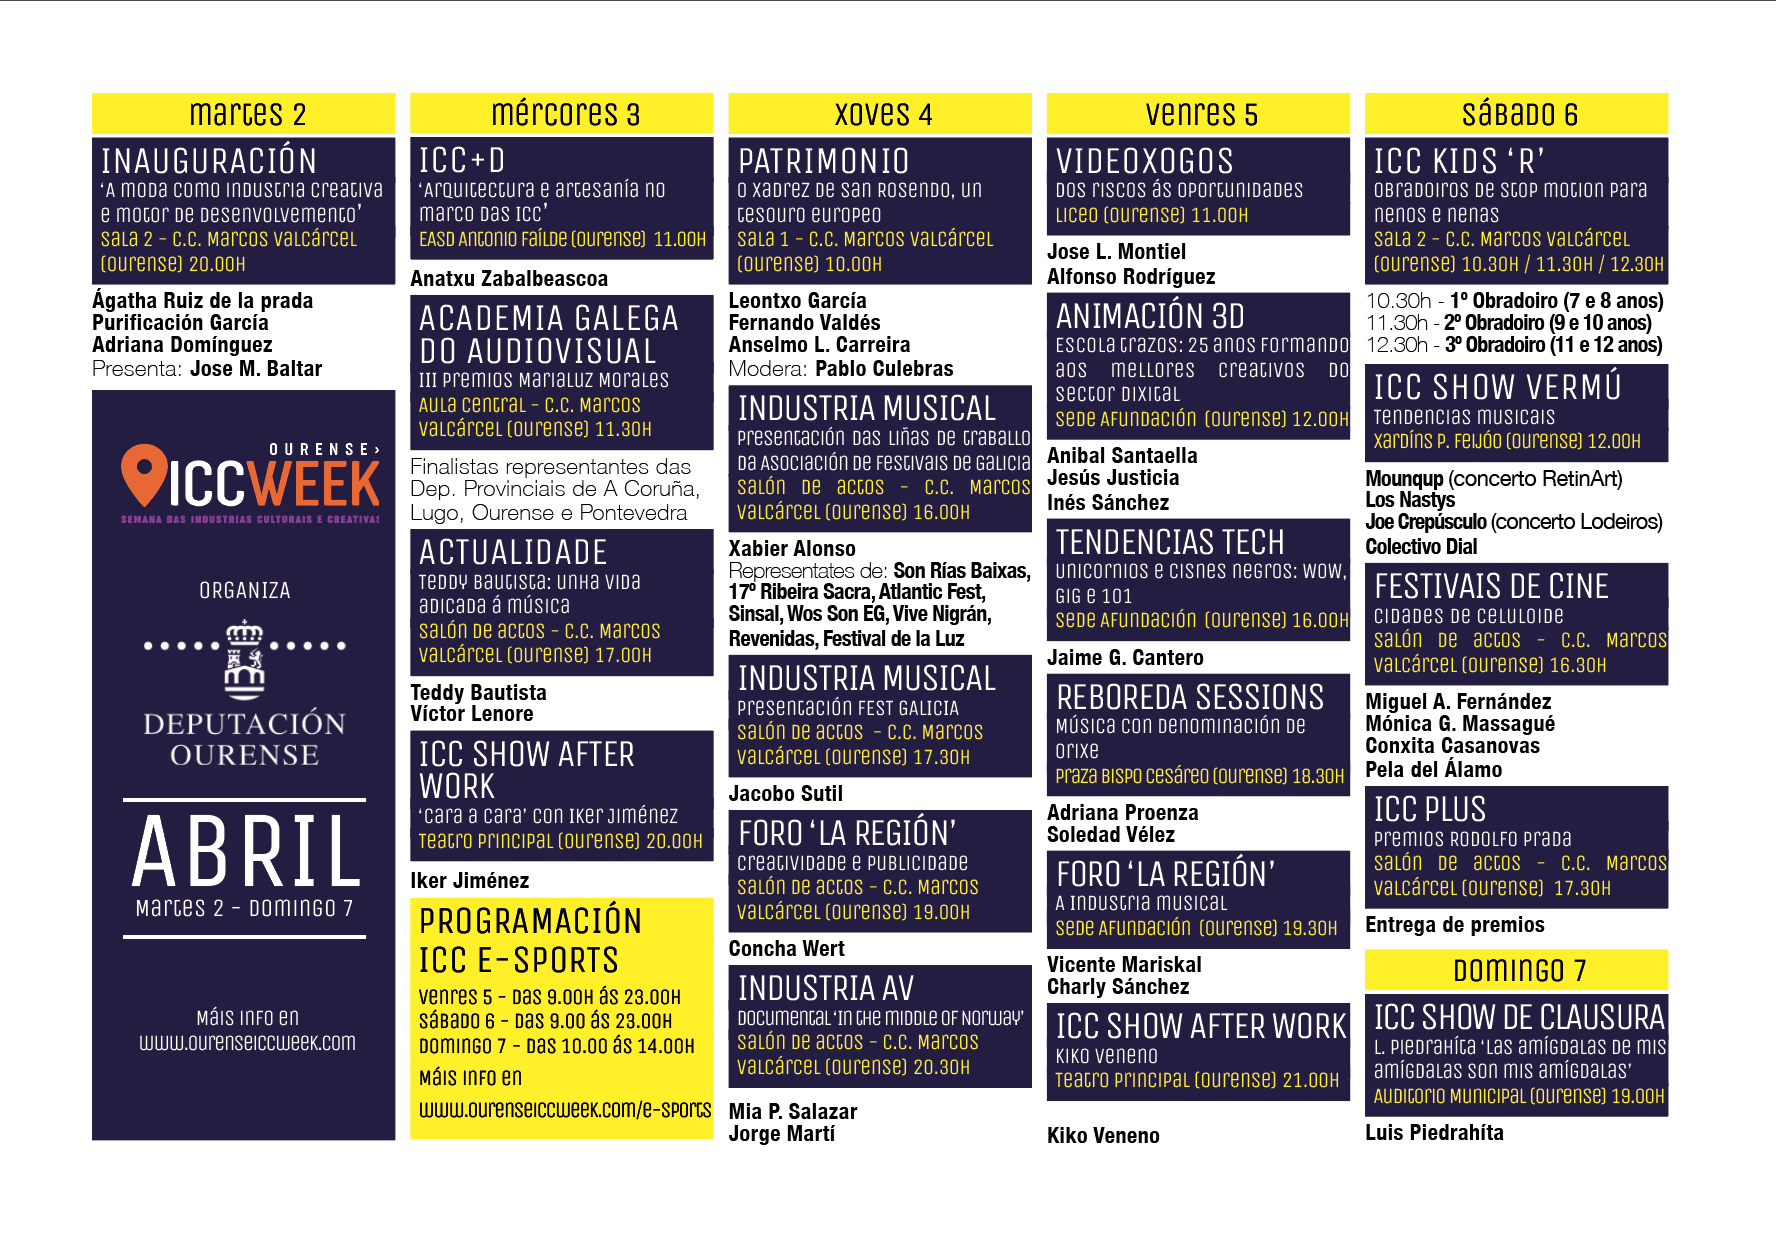 ICC Week (Semana das Industrias Culturais e Creativas